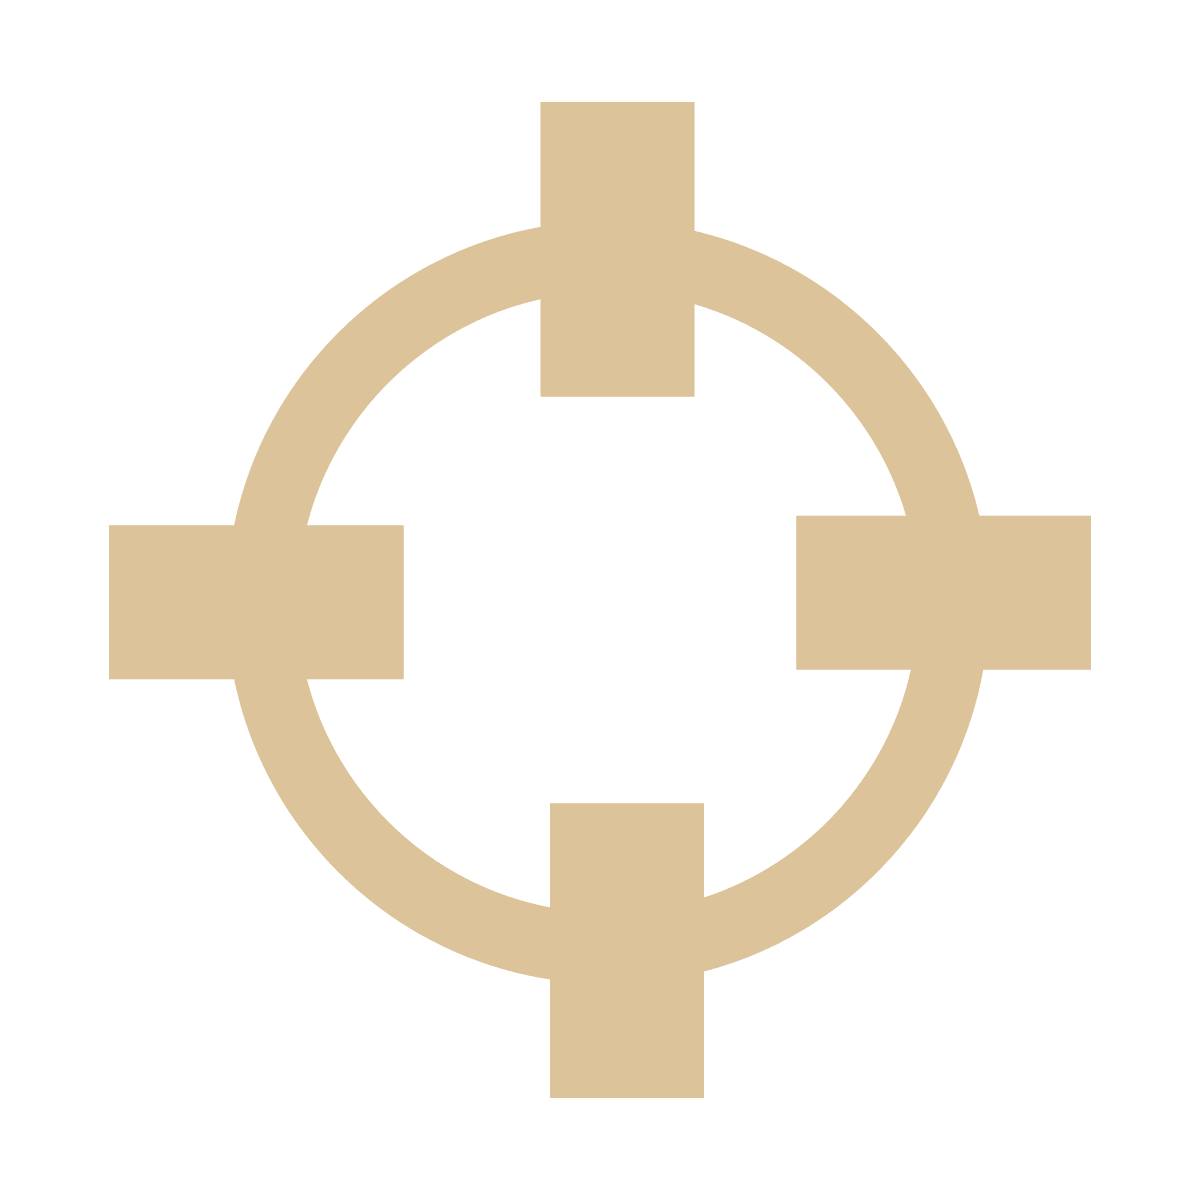 arvense-group-5f-methodology-step-3-focus-tan